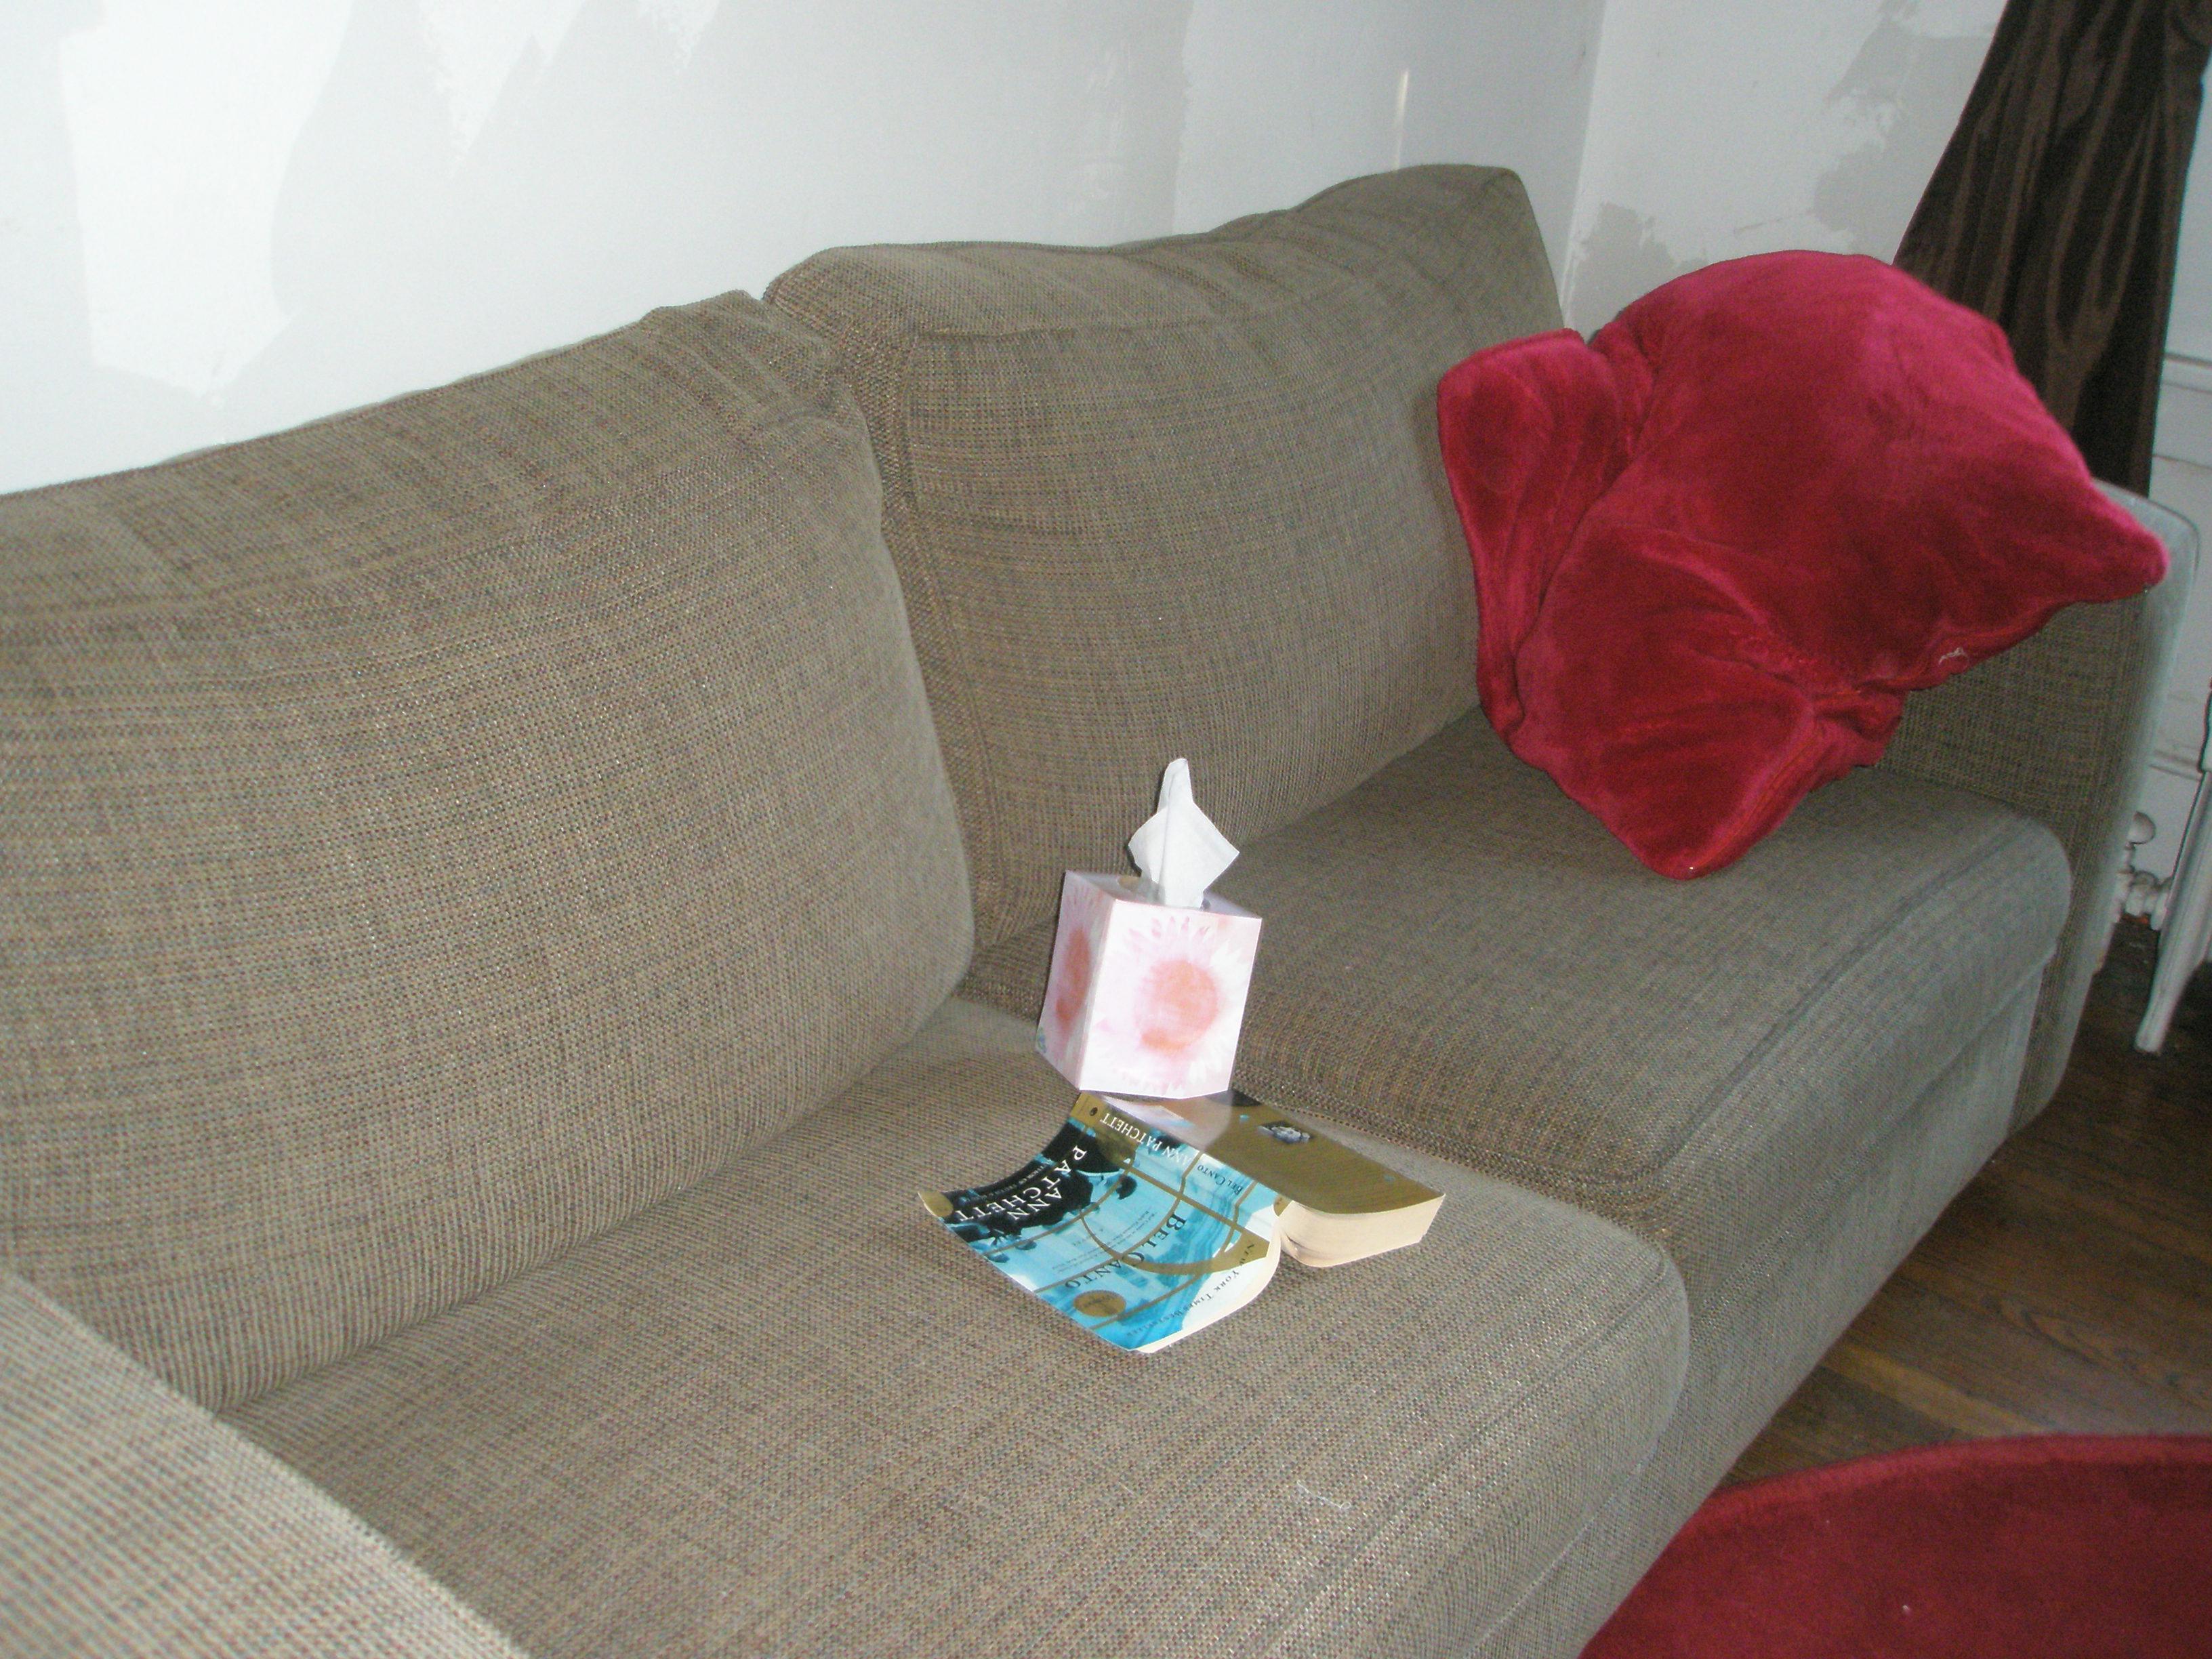 Kleenex, literature, or the pillow?